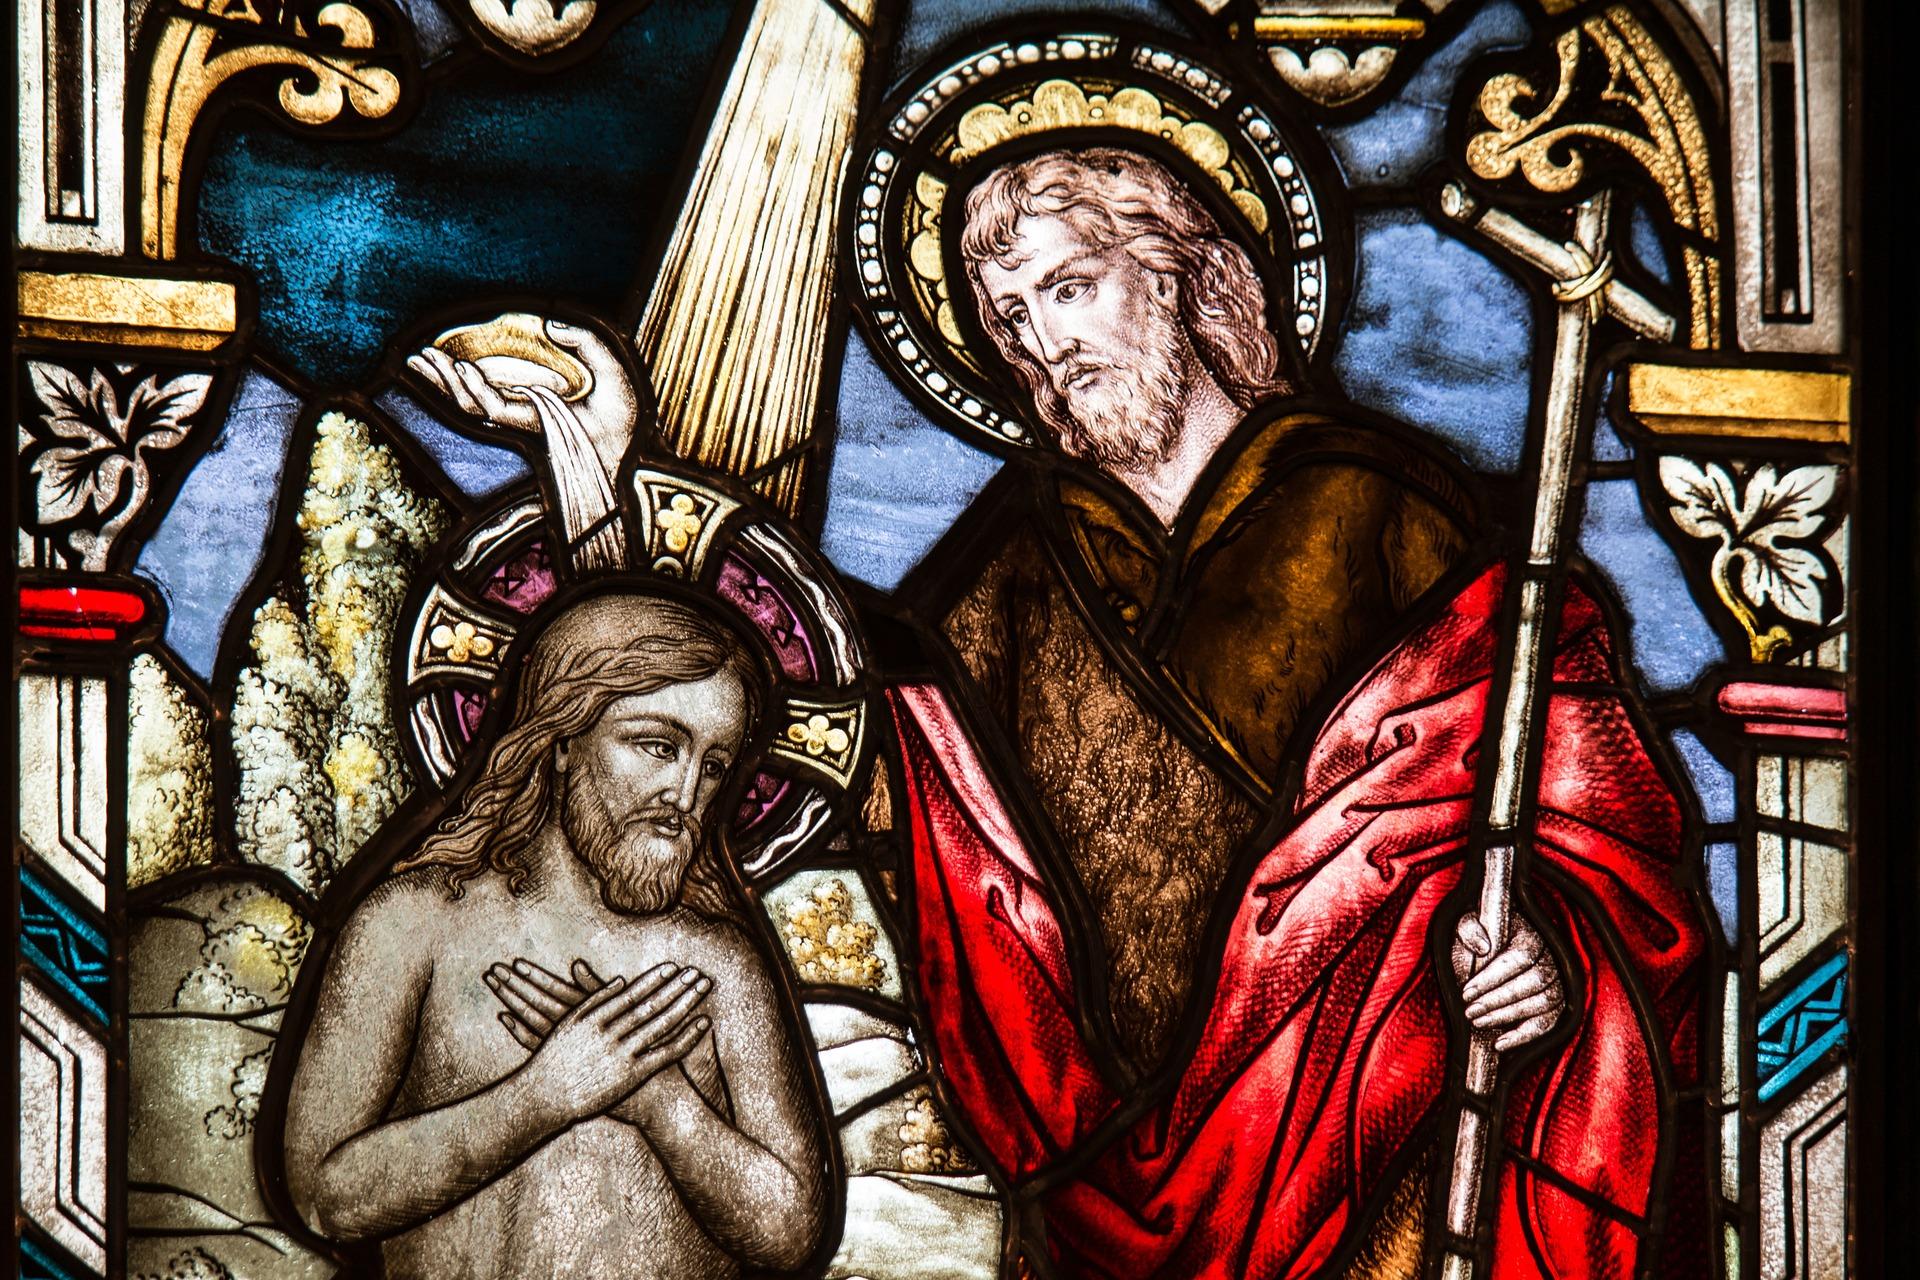 jesus-and-god-vitral